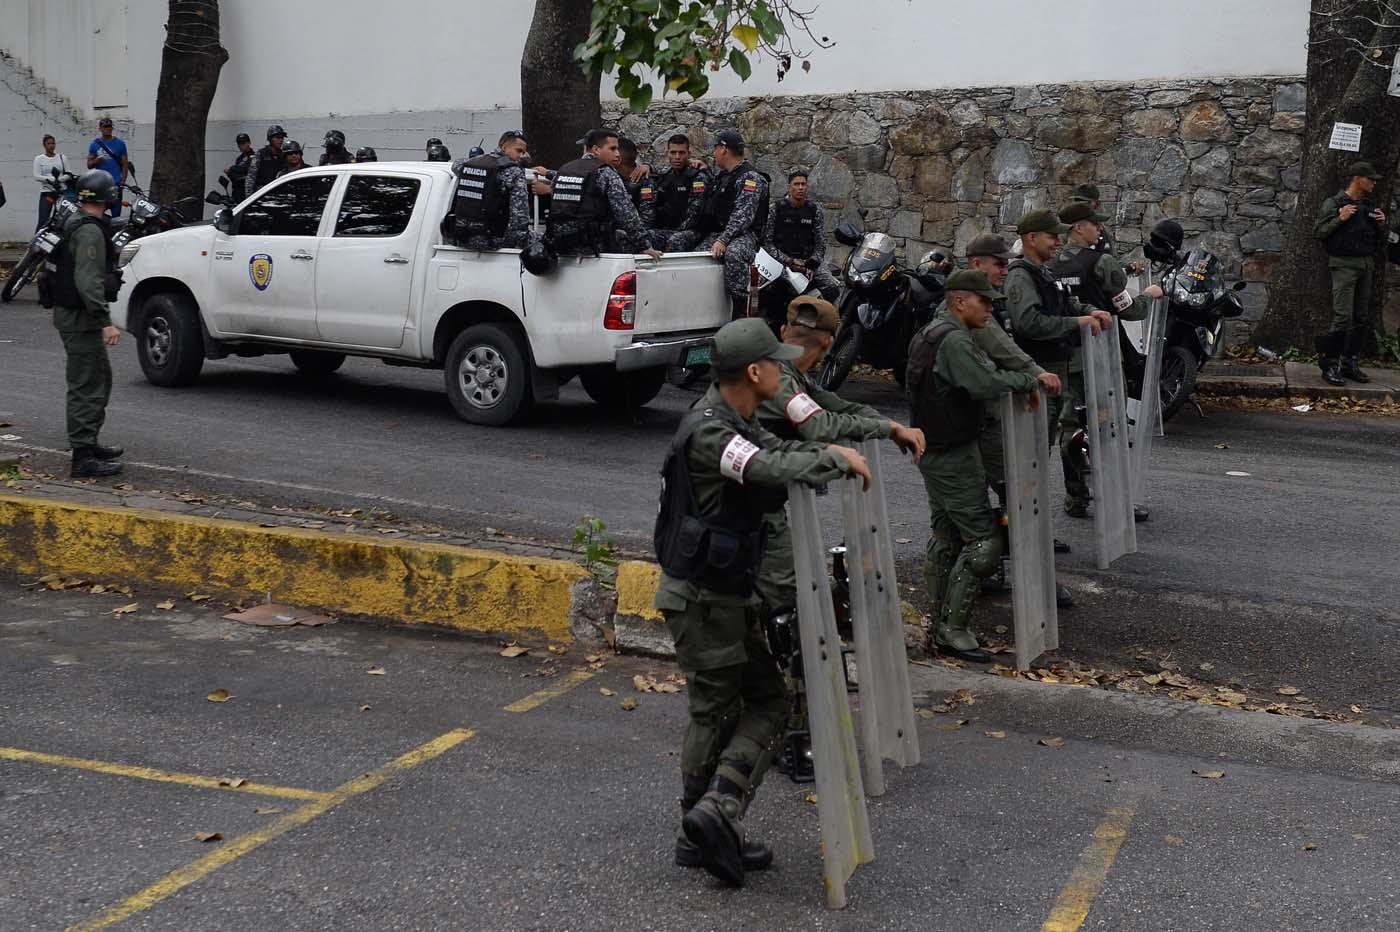 Foto: AFP / Federico PARRA